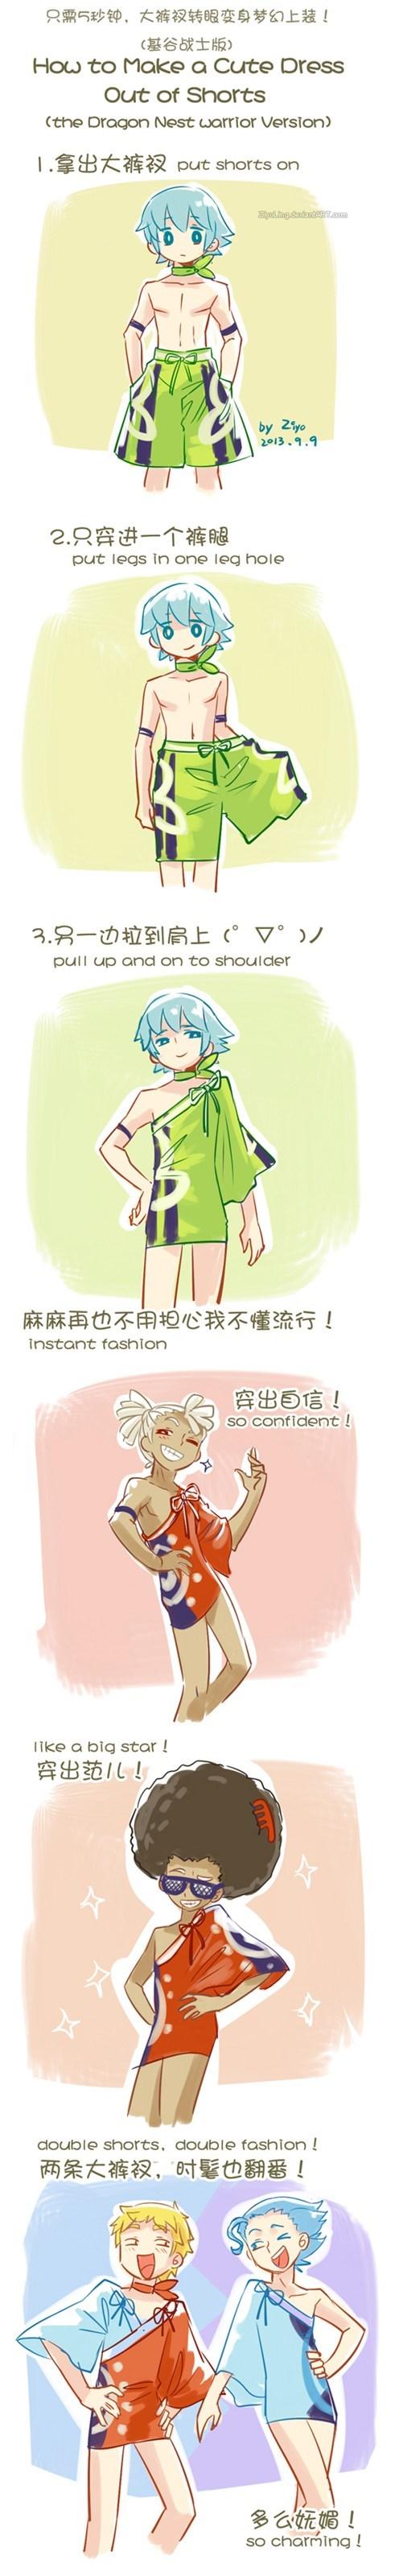 shorts,anime,Life Hack,DIY,dress